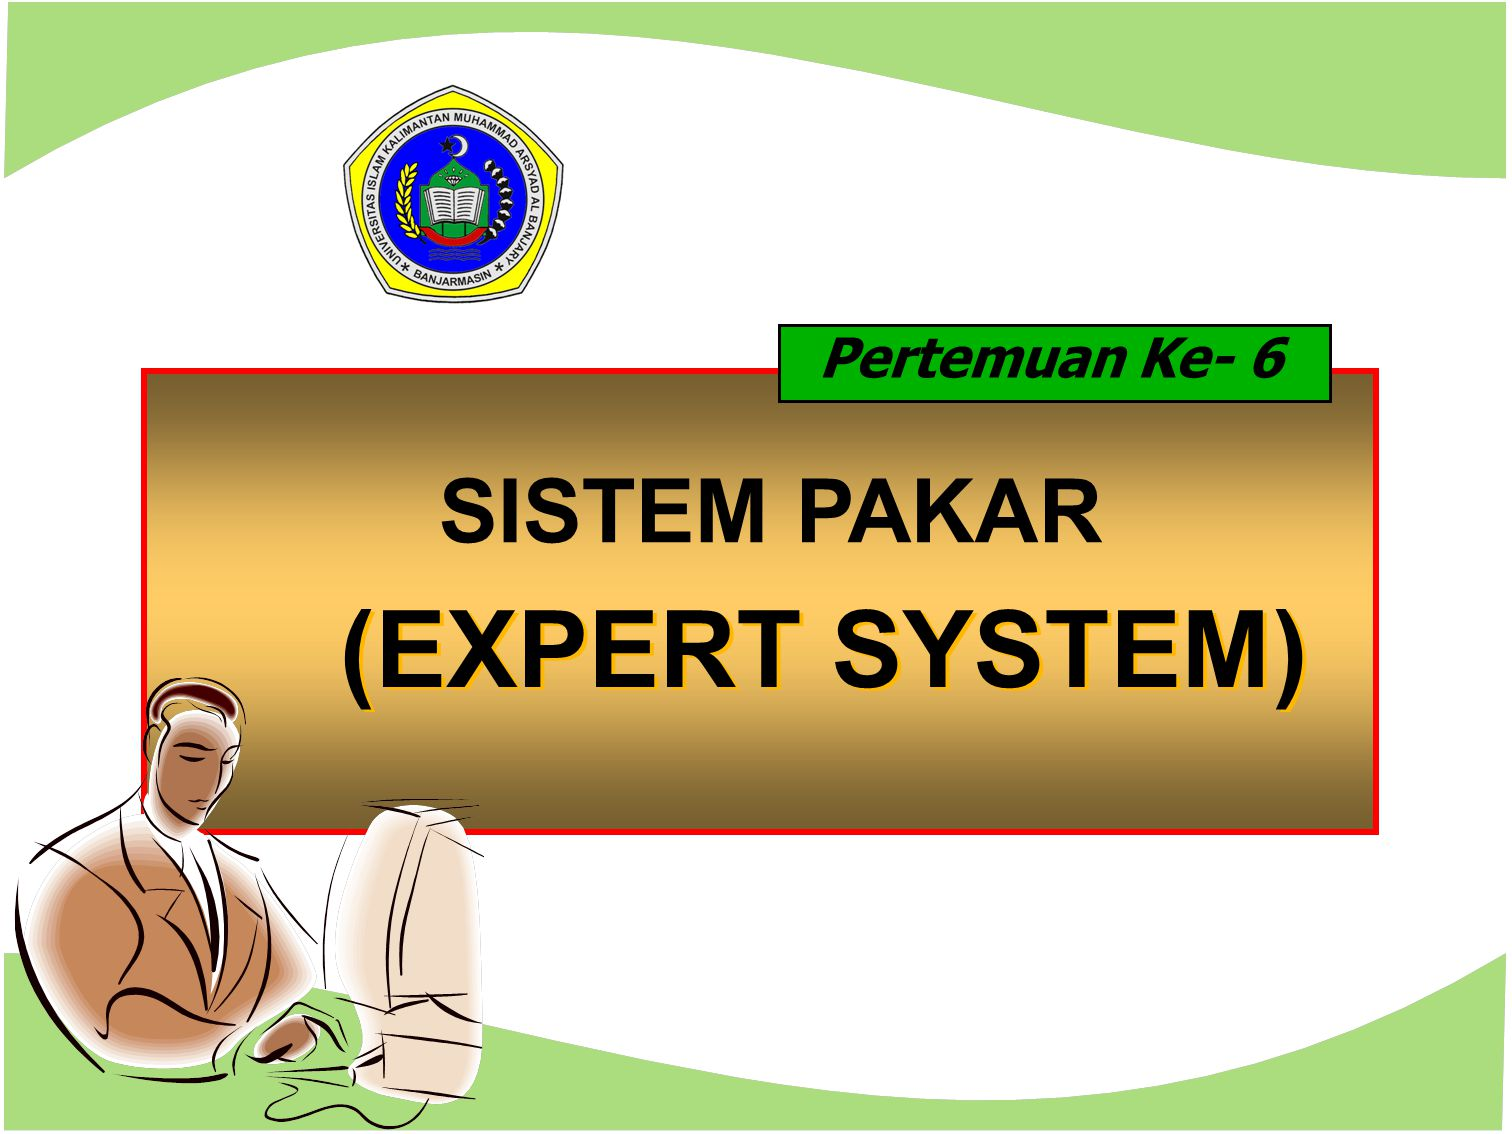 DEFINISI SISTEM PAKAR (EXPERT SYSTEM): Sebuah program komputer yang dirancang untuk memodelkan kemampuan menyelesaikan masalah seperti layaknya seorang pakar (human expert).